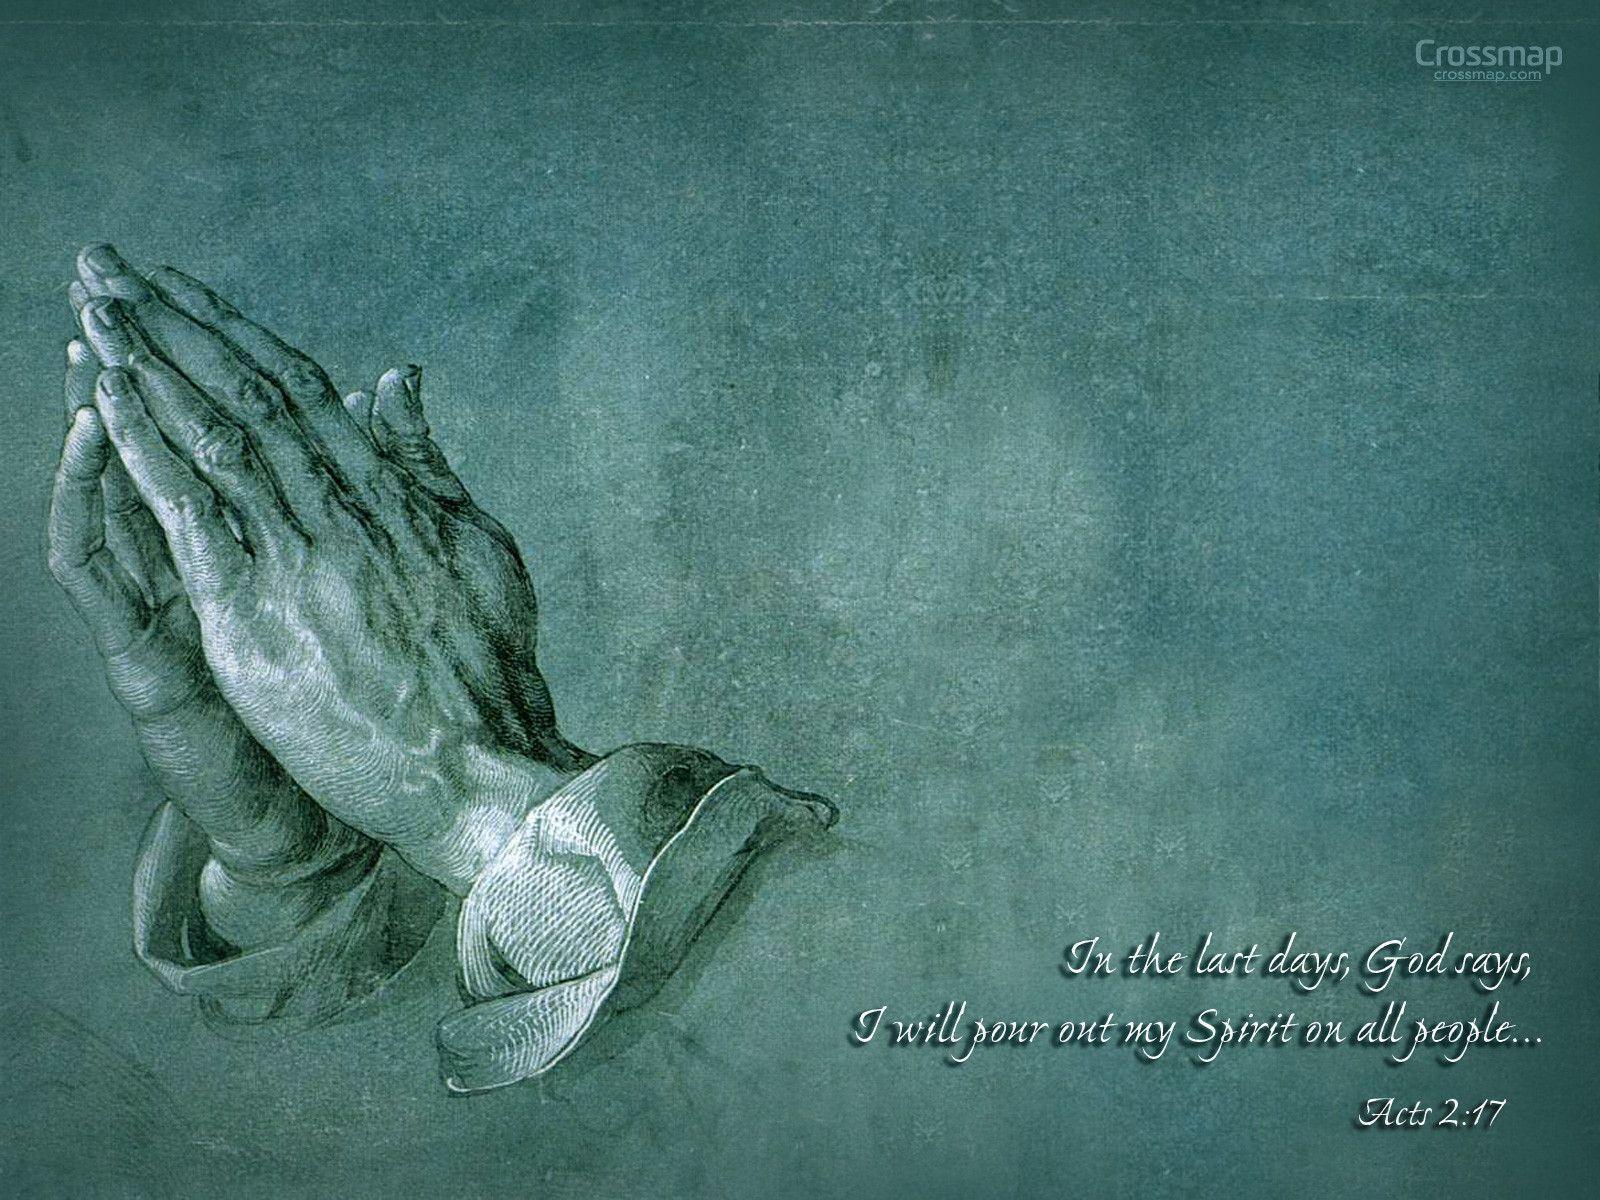 Praying Hands Wallpapers Wallpaper Cave